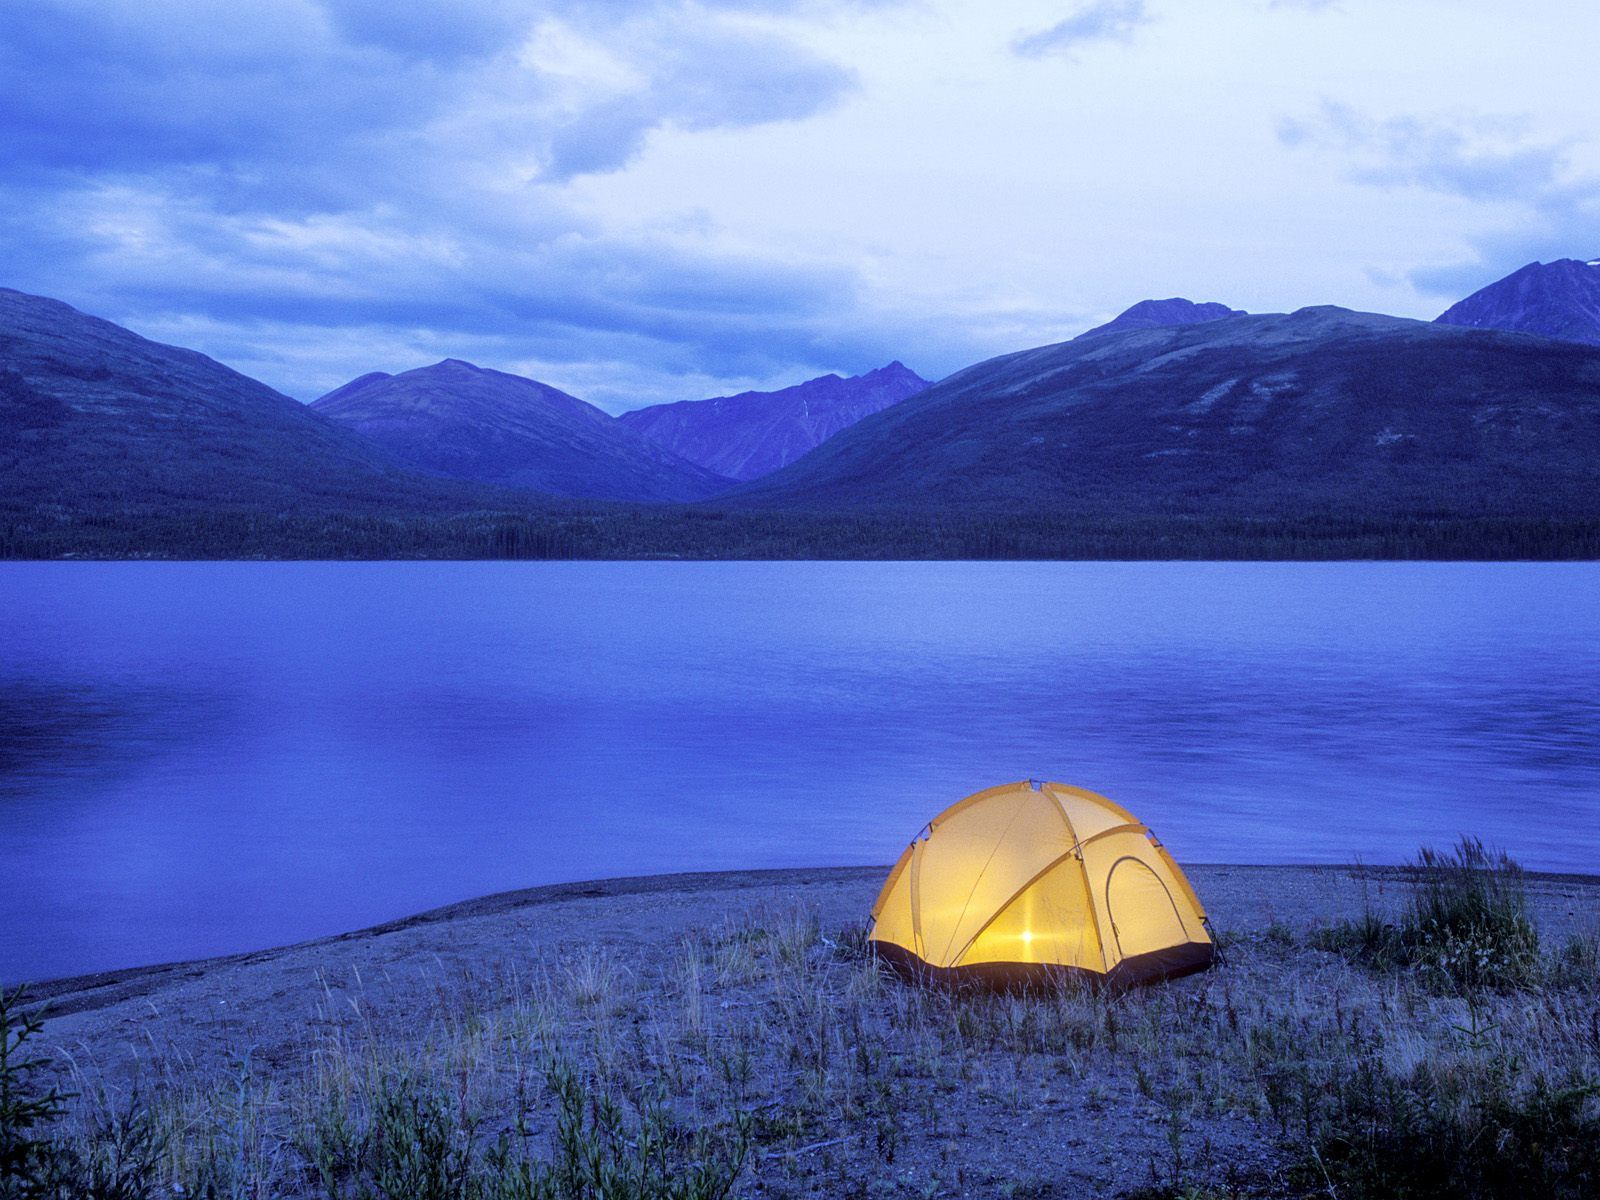 camping-wallpaper-15